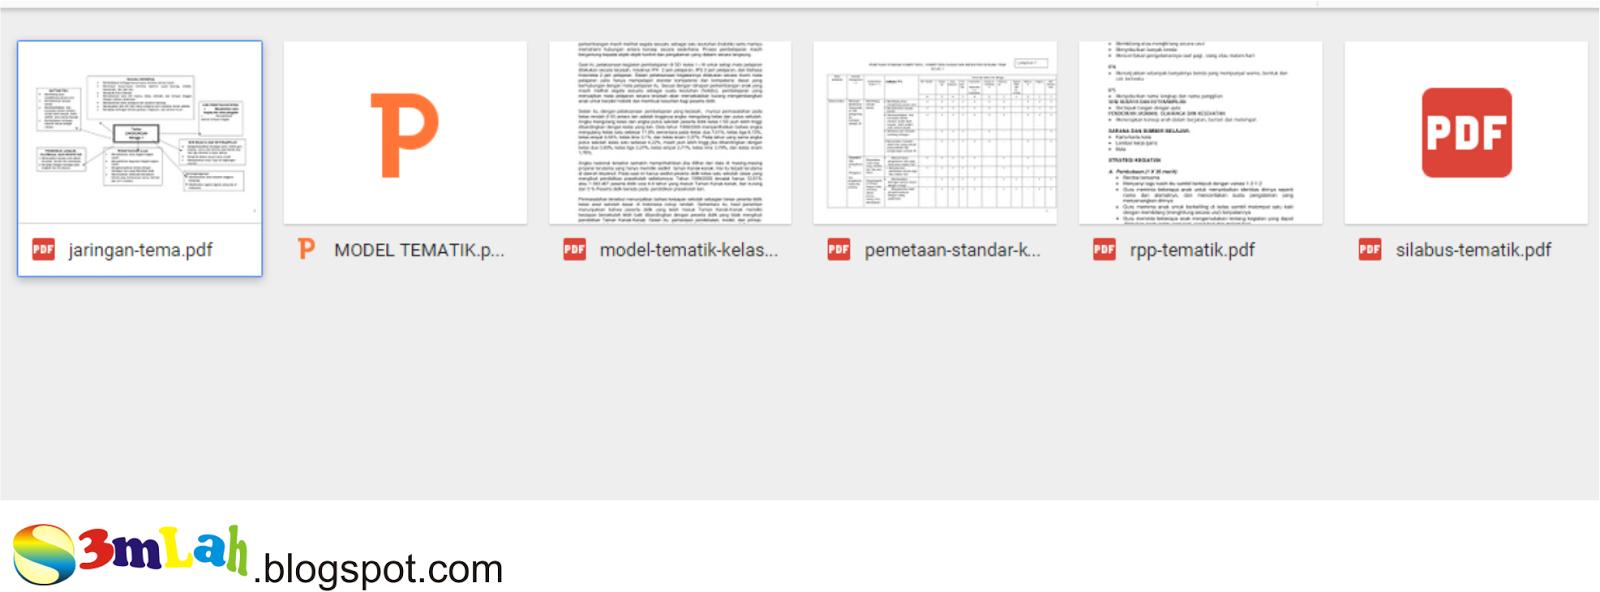 Materi Ajar Bahasa Indonesia Matematika Ipa Ips Tik Tematik Sd Lengkap Kurikulum Ktsp